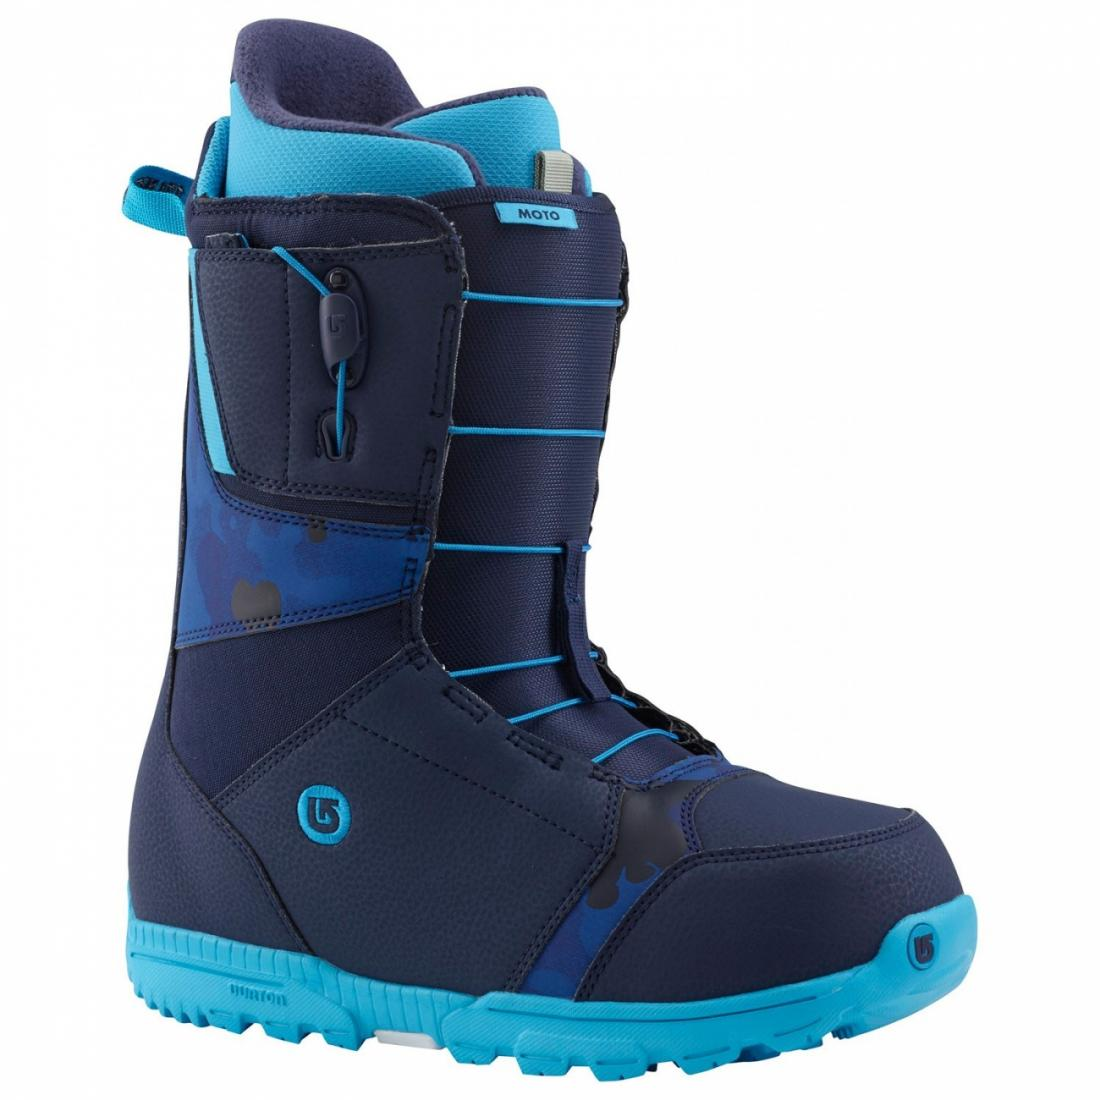 Burton Ботинки сноубордические MOTO